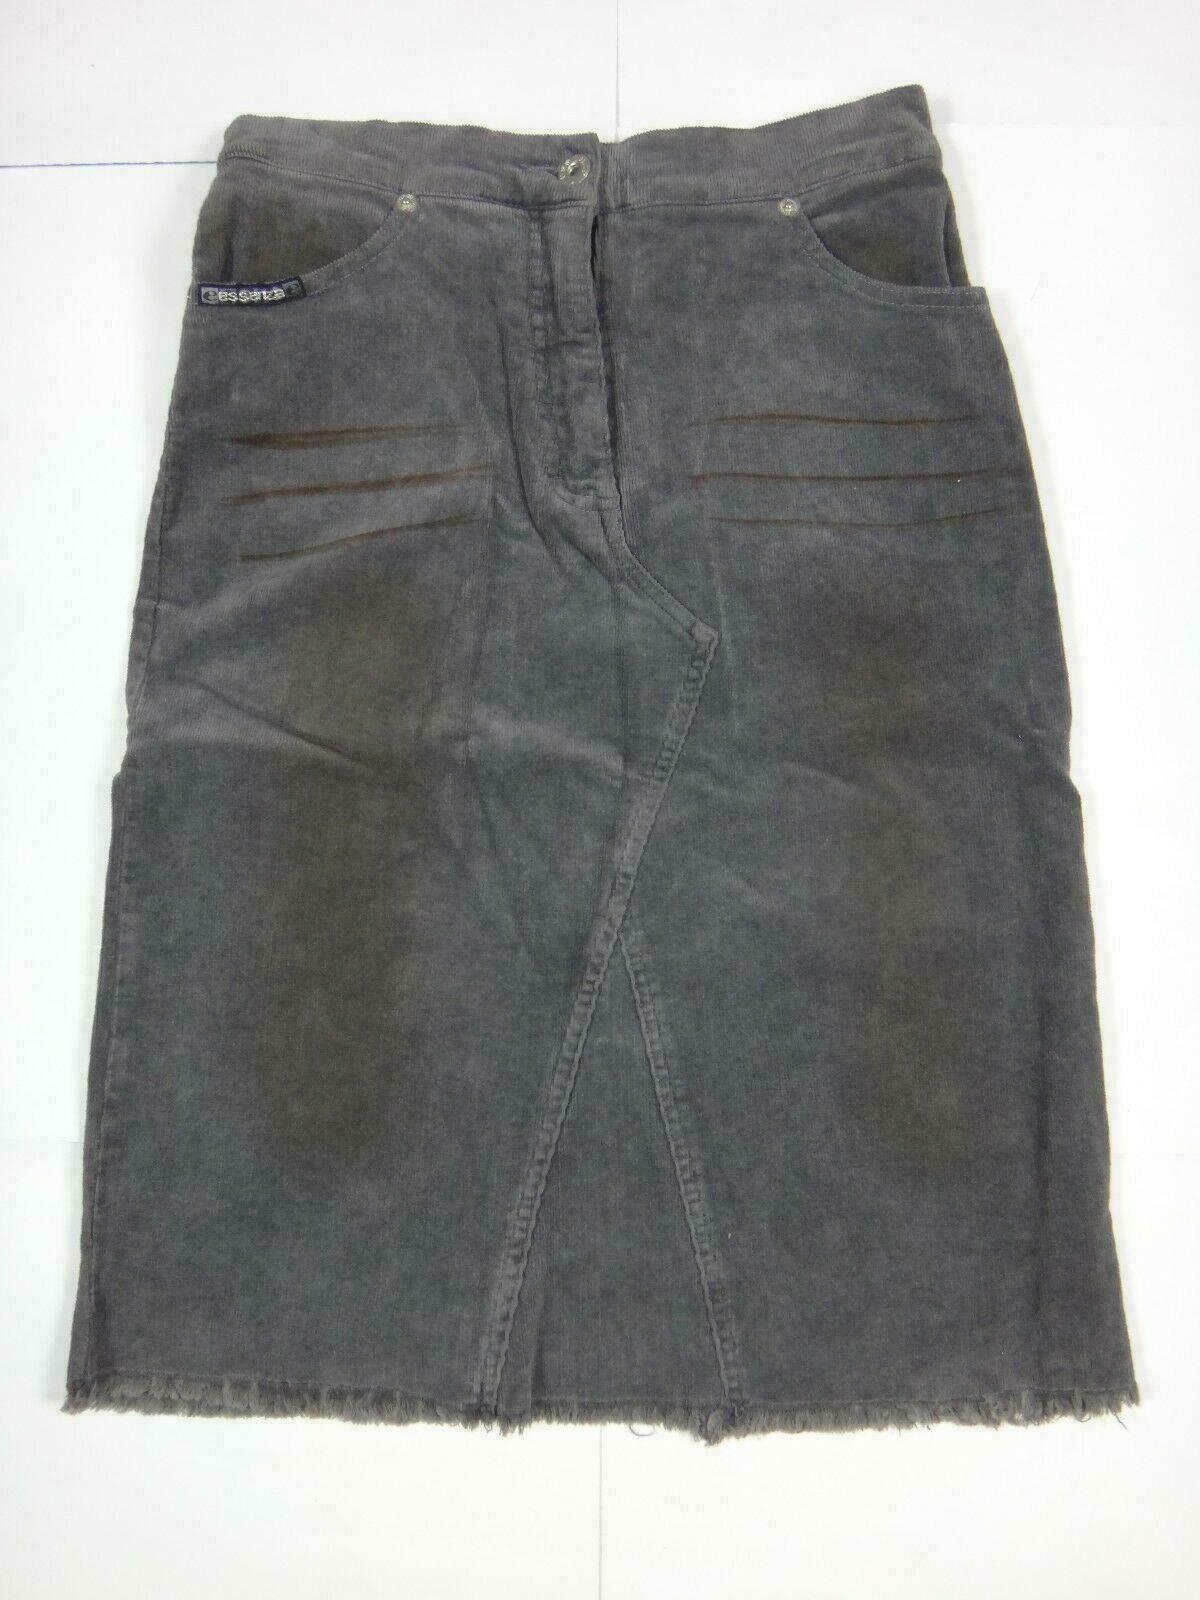 27001 Womens Skirt Fabric Essenza Size 26 Dark Grey; stretch